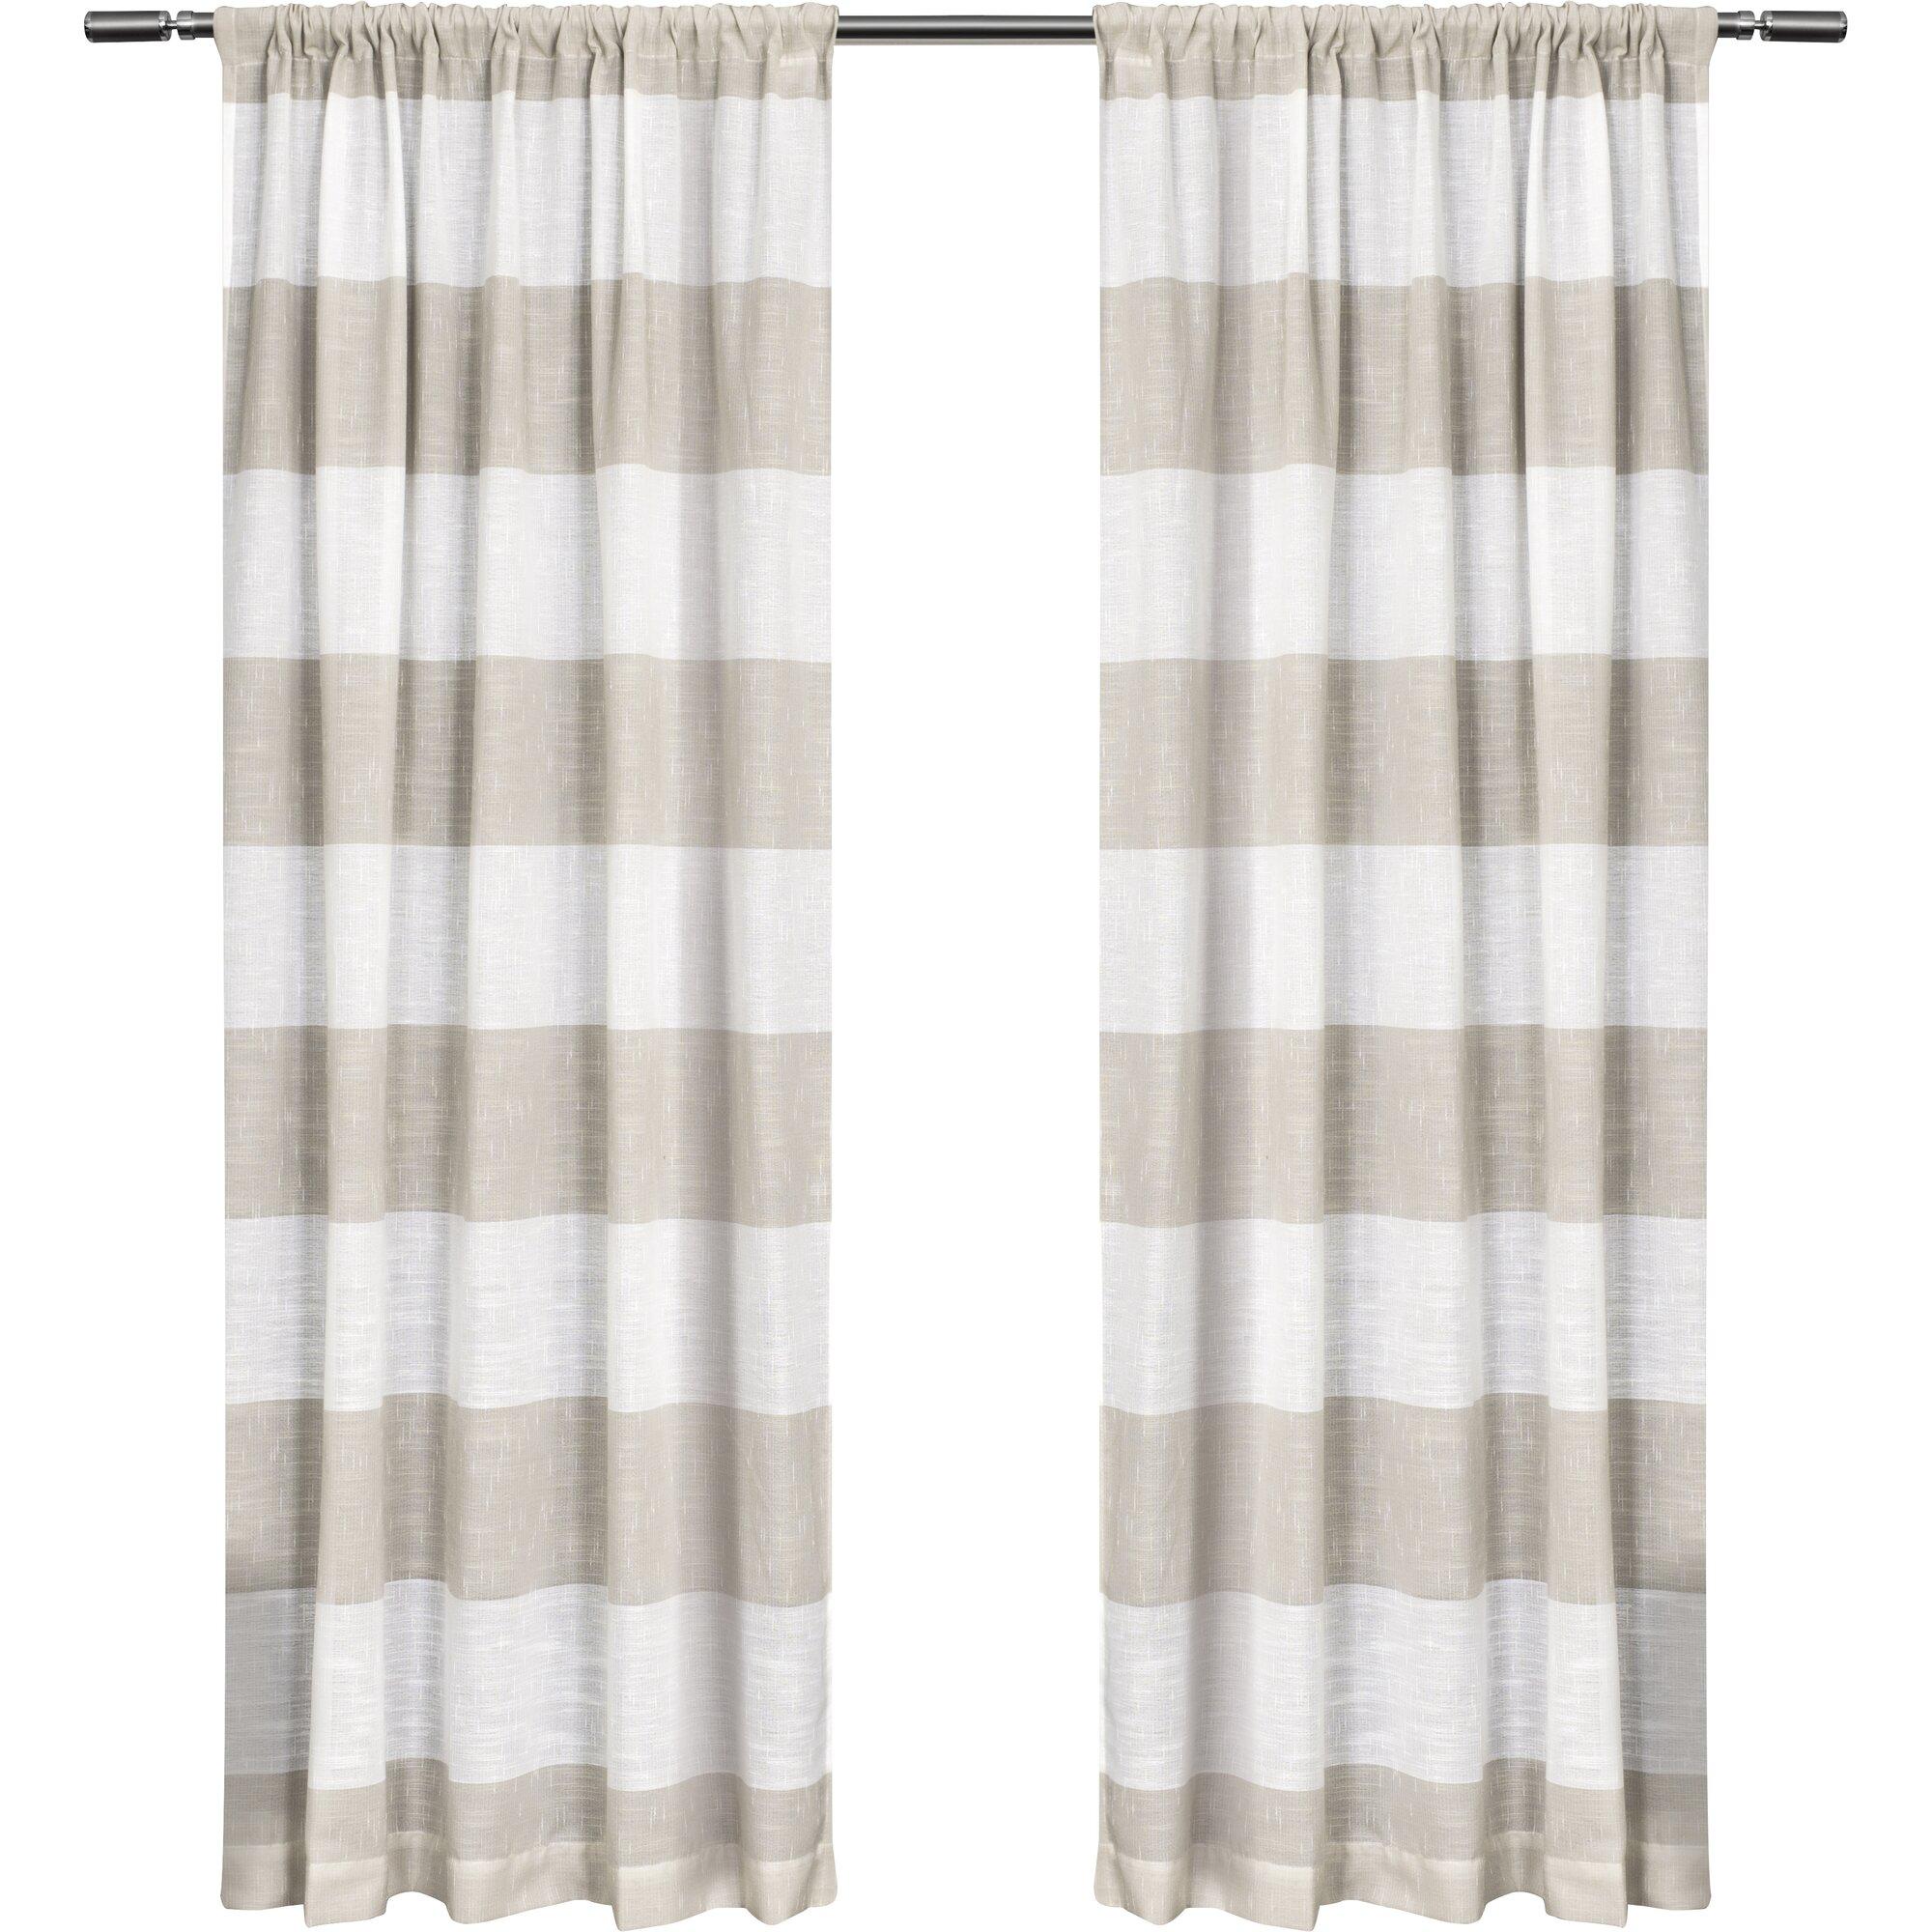 Brown plaid curtain panels - Birch Harbor Striped Semi Sheer Rod Pocket Curtain Panels